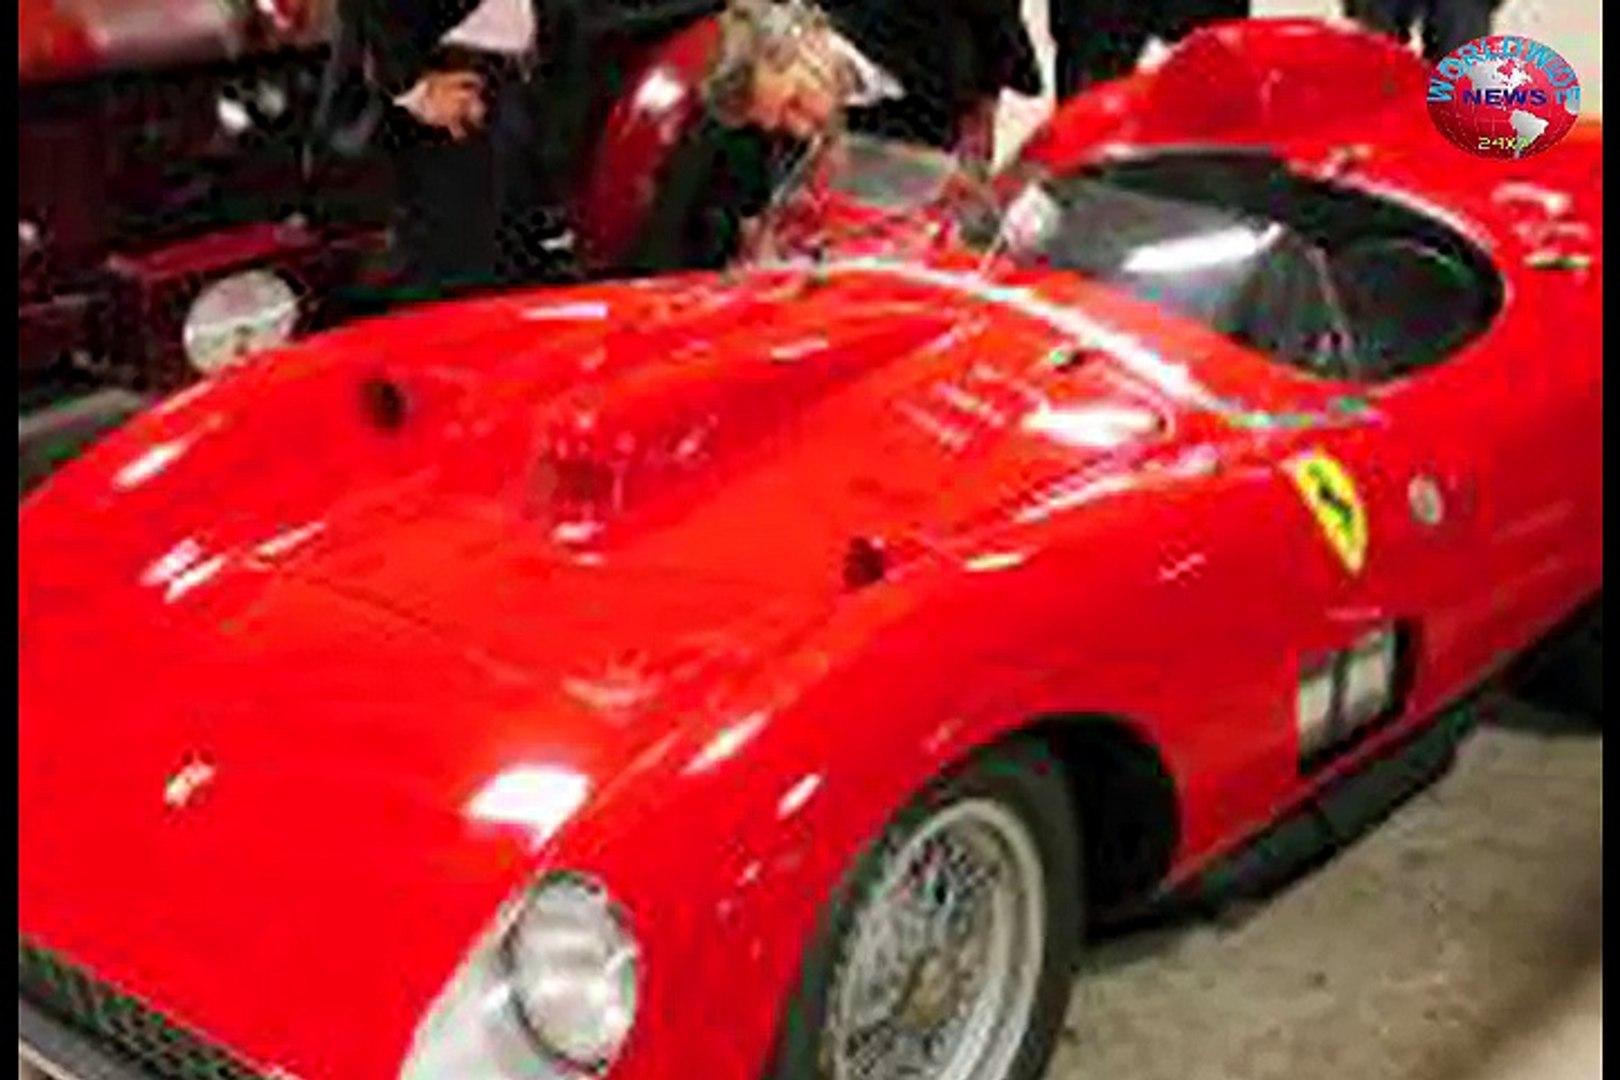 1957 Ferrari 335 S Spider Scaglietti Auctioned For Record 32 Million Euros Video Dailymotion